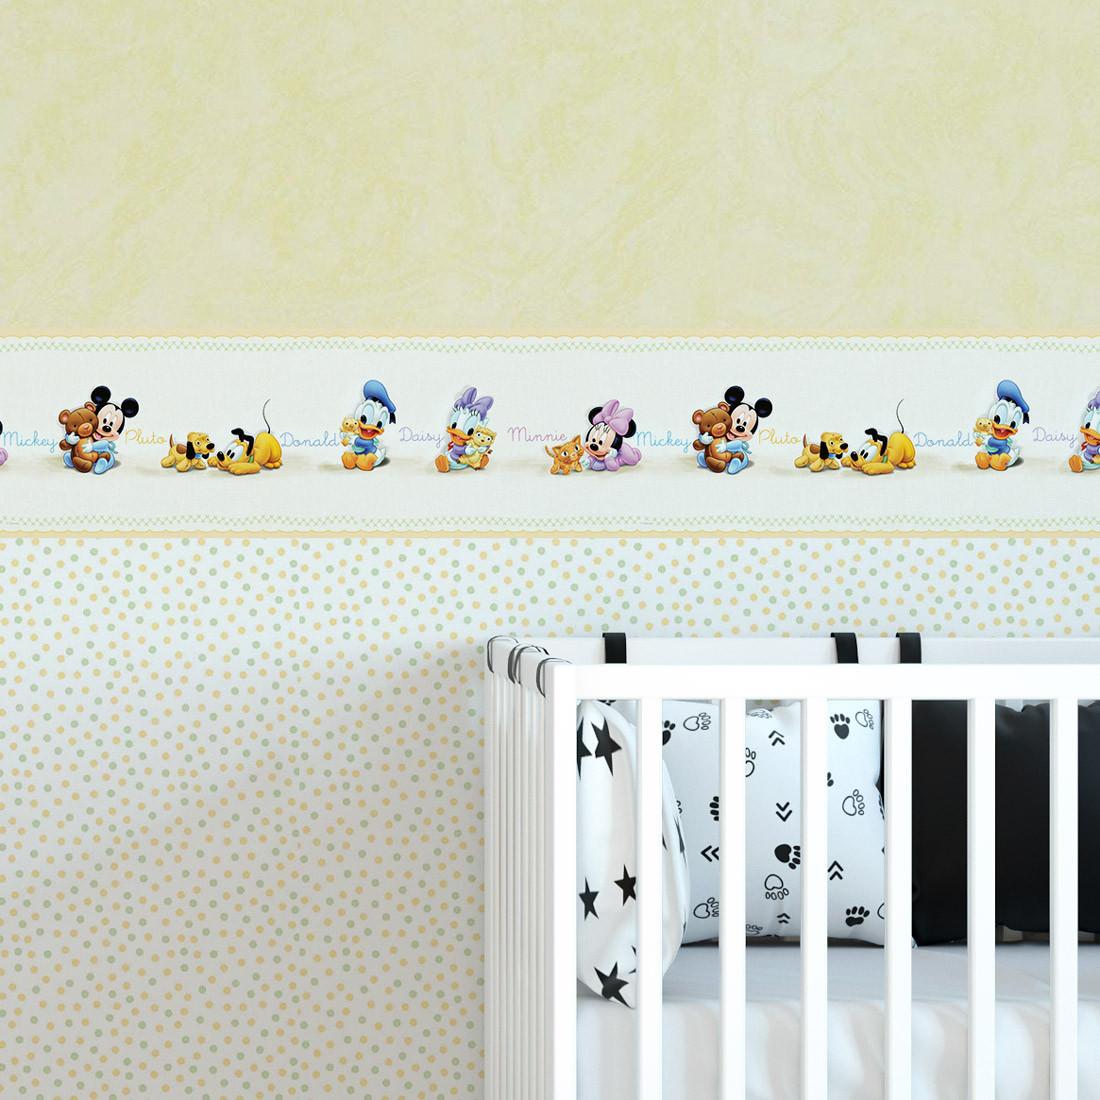 Faixa Decorativa Infantil Disney Baby - Disney